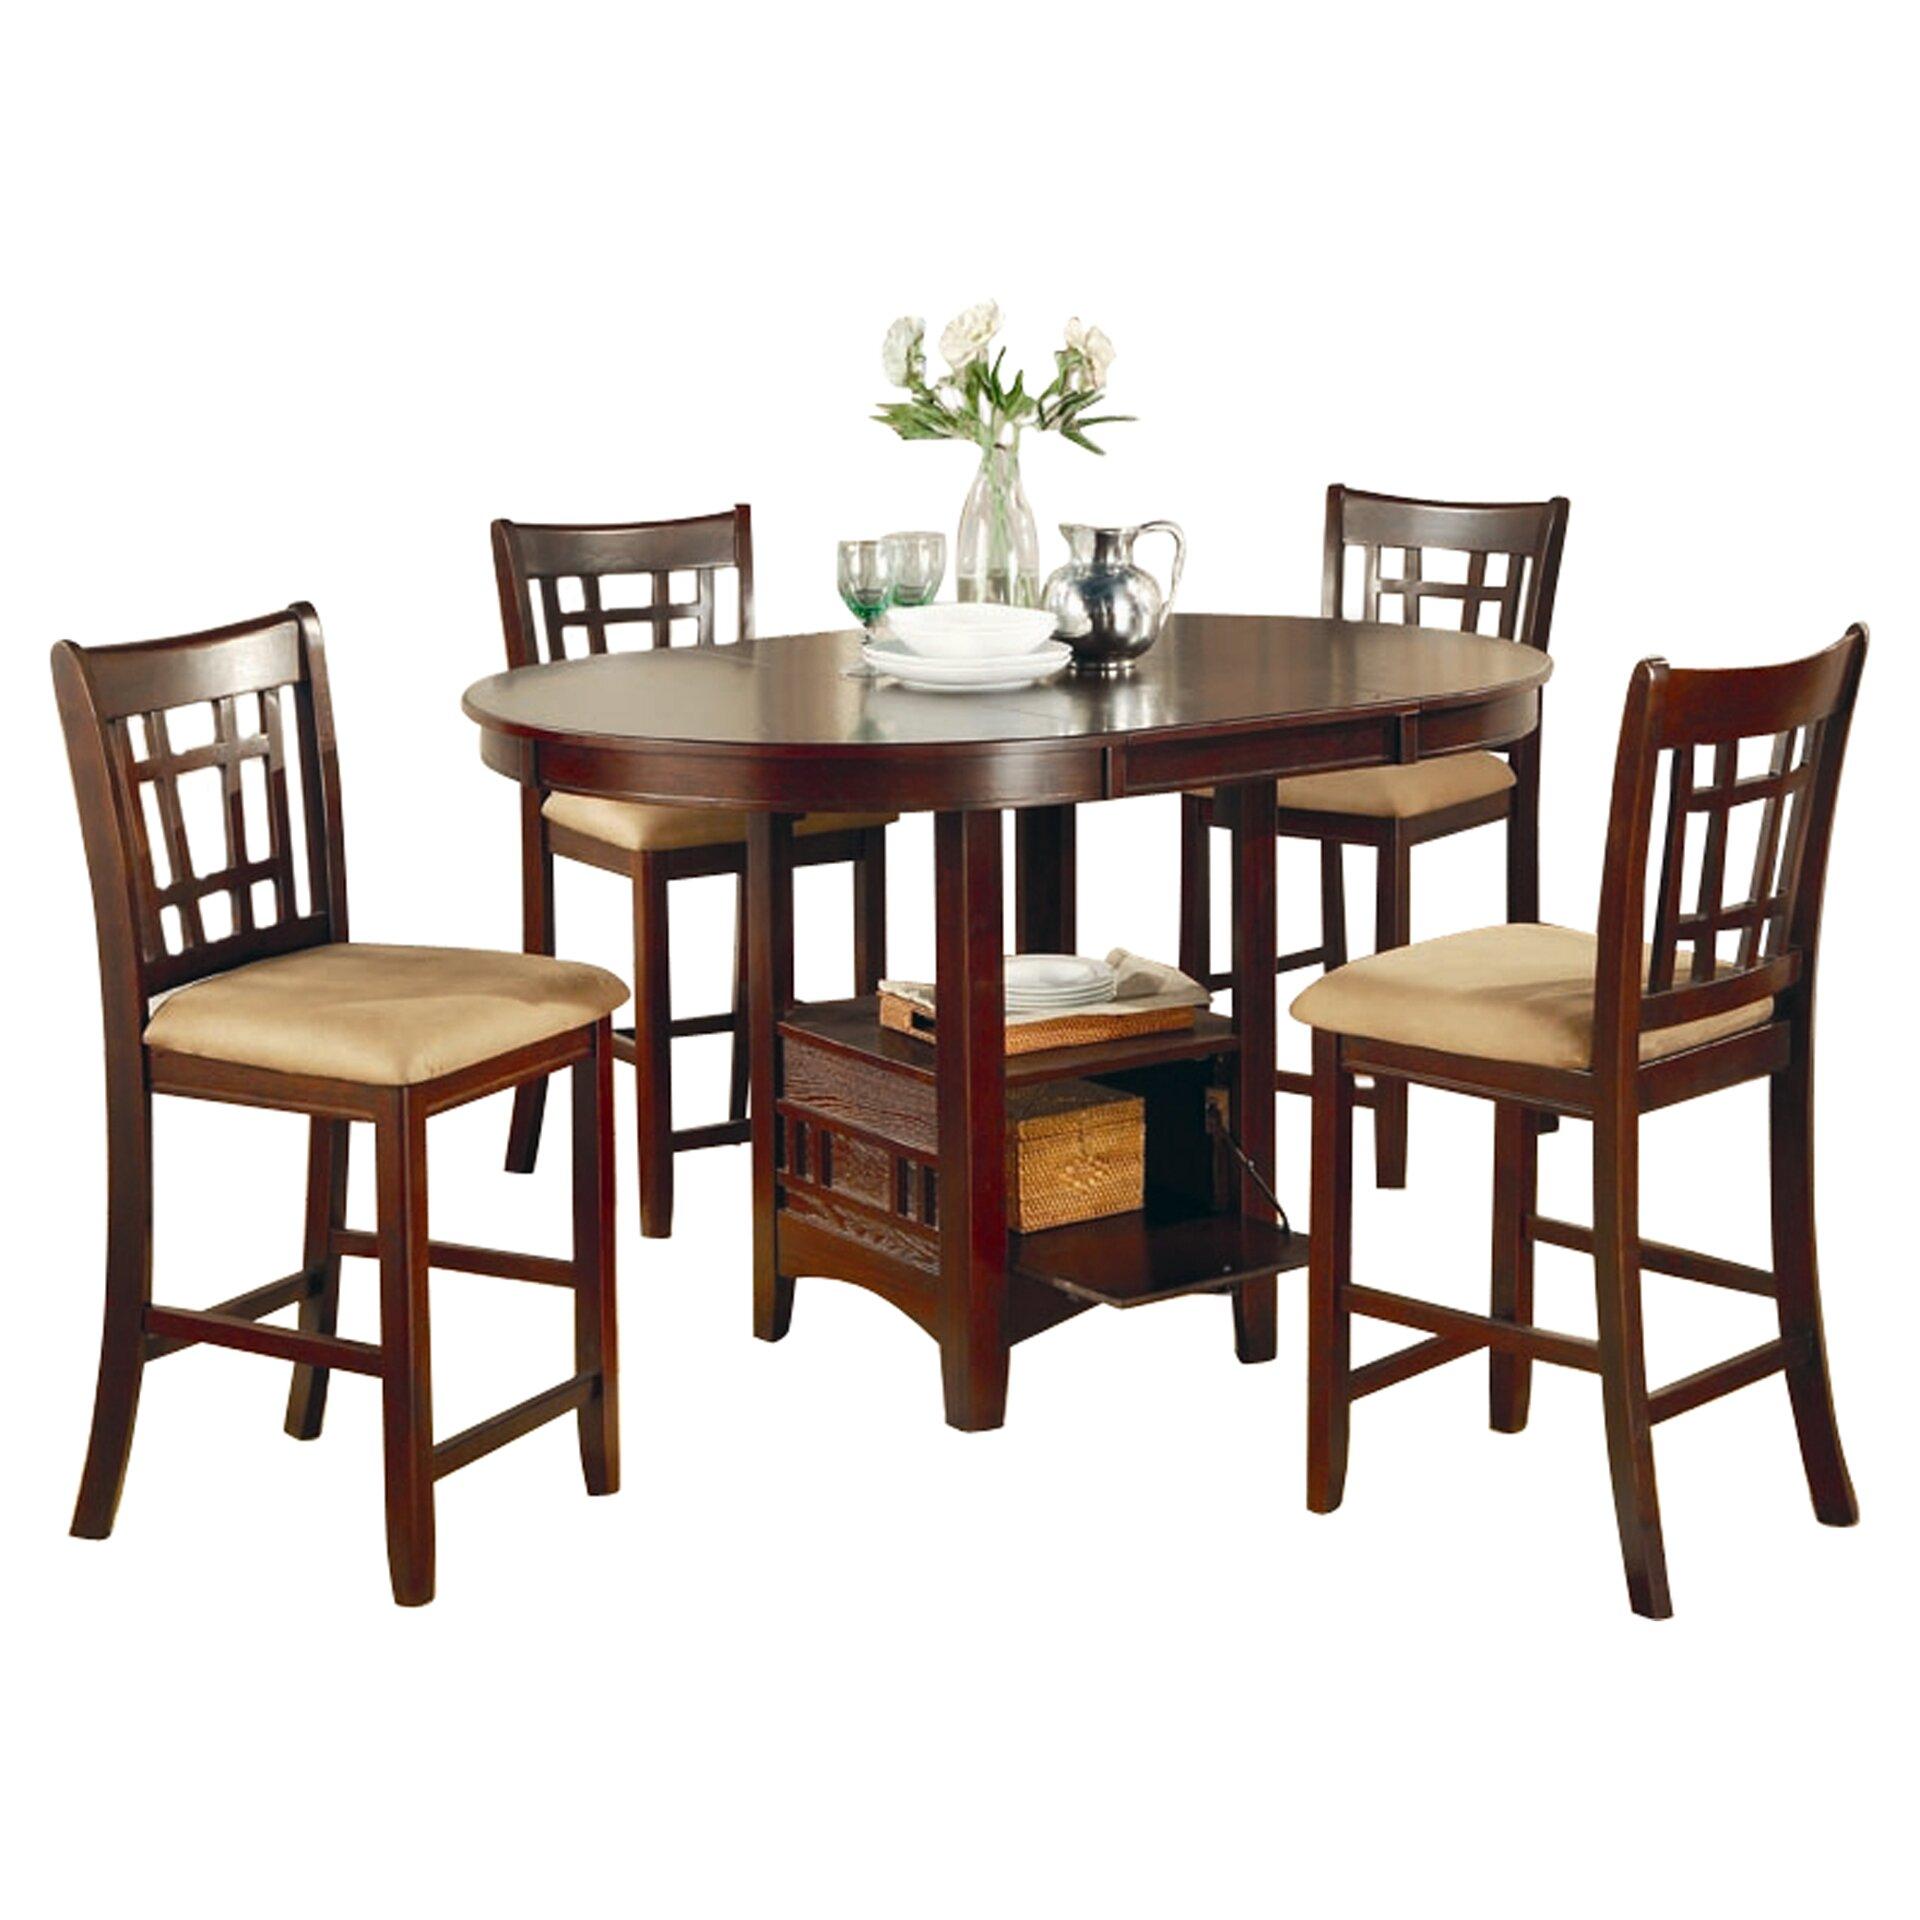 Dining Table Height Simple Modern Height Table Natural X  : NorwalkCounterHeightExtendableDiningTable from buildhouse.biz size 1920 x 1920 jpeg 210kB